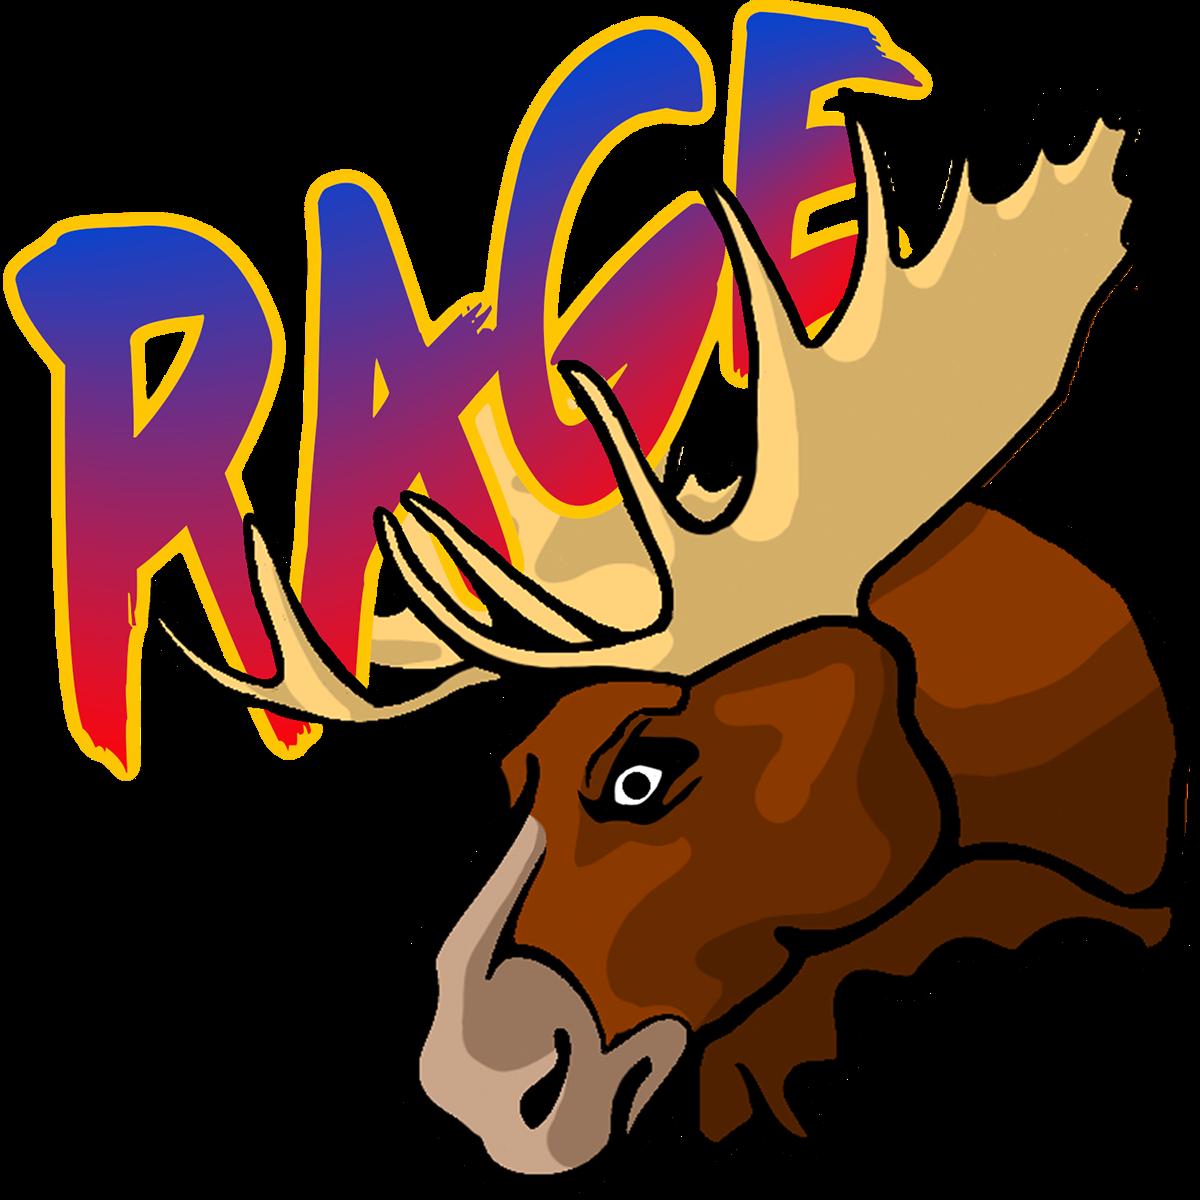 Moose clipart wildlife alaska. Lifeinalaska twitch emotes on